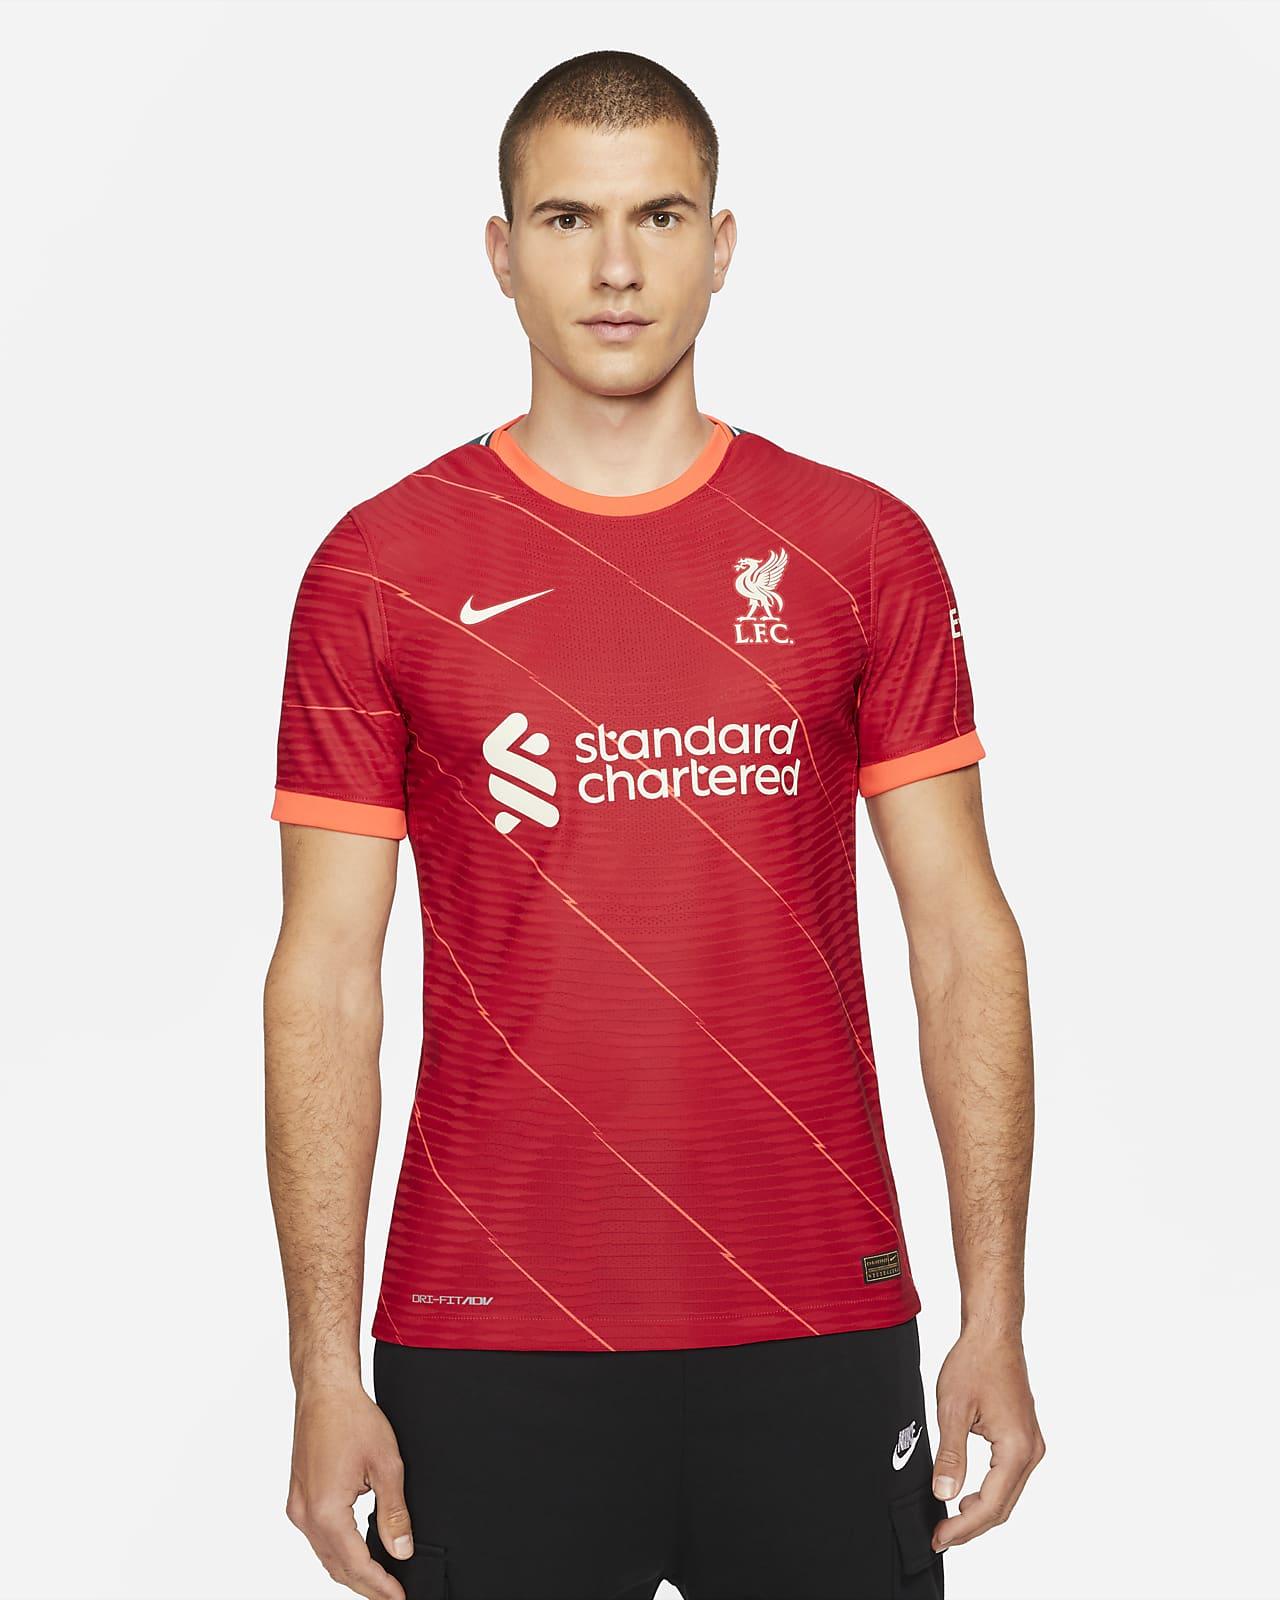 Liverpool FC 2021/22 Match Home Men's Nike Dri-FIT ADV Soccer Jersey